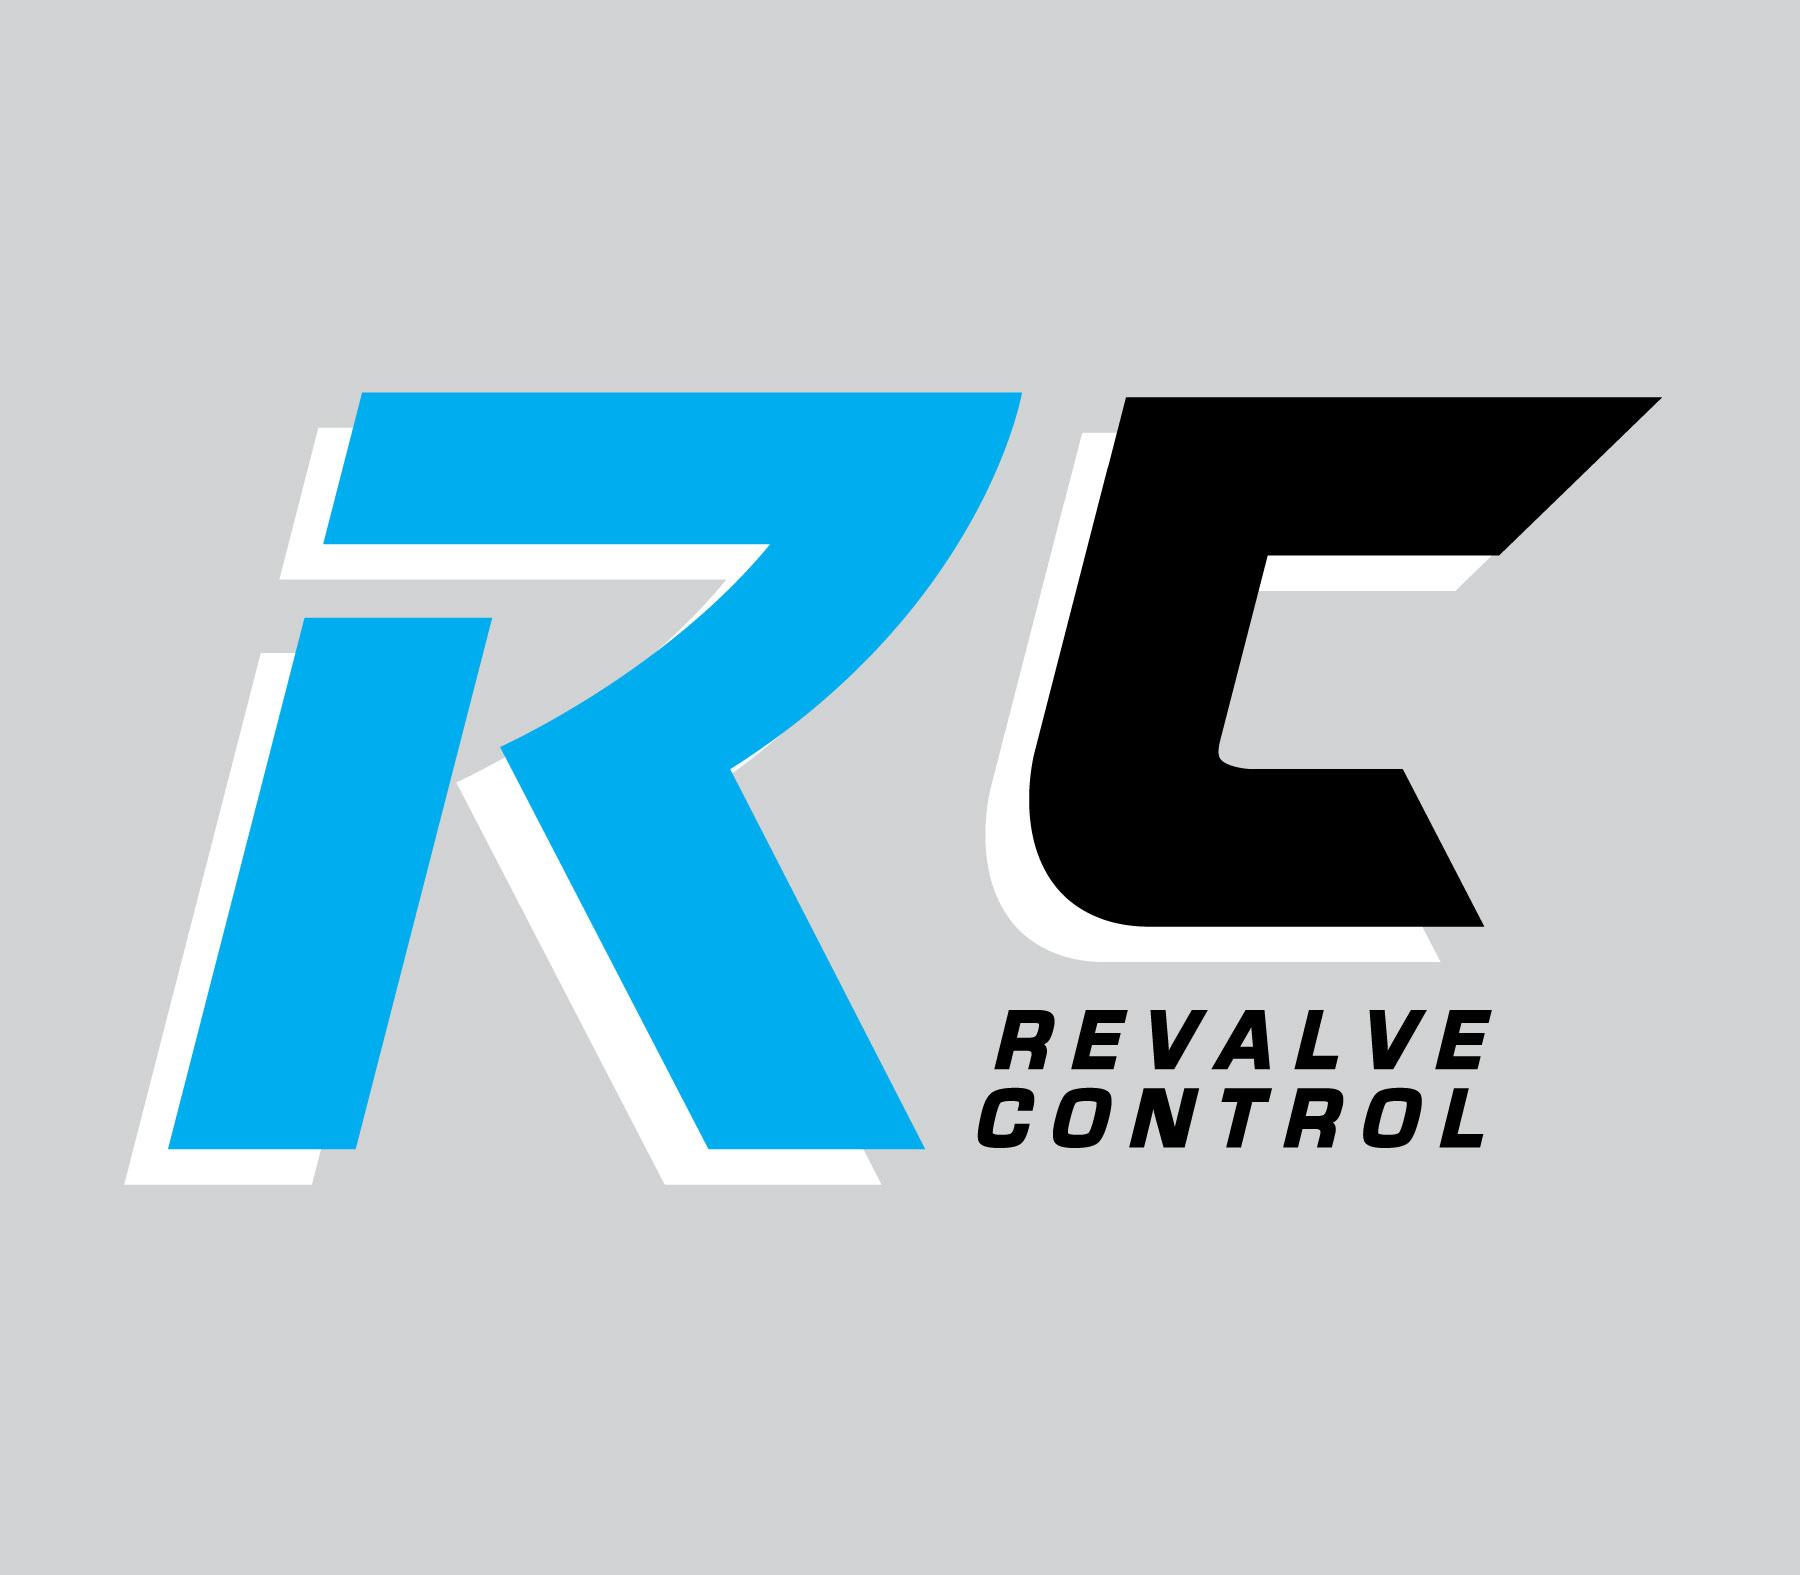 AER48 Revalve Control — Kreft Moto